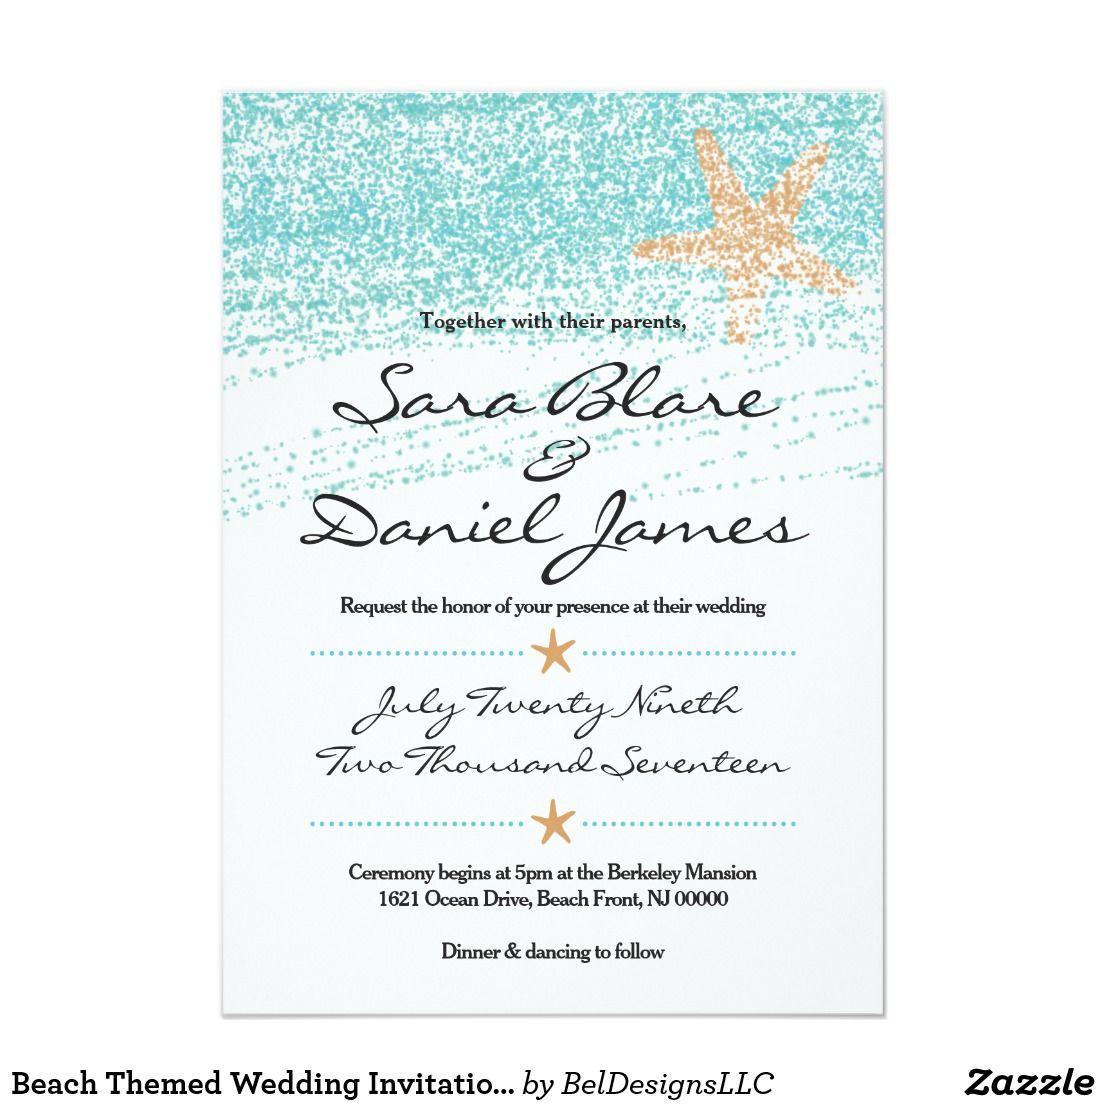 Beach Themed Wedding Invitation w/ Starfish Accent | Beach Wedding ...